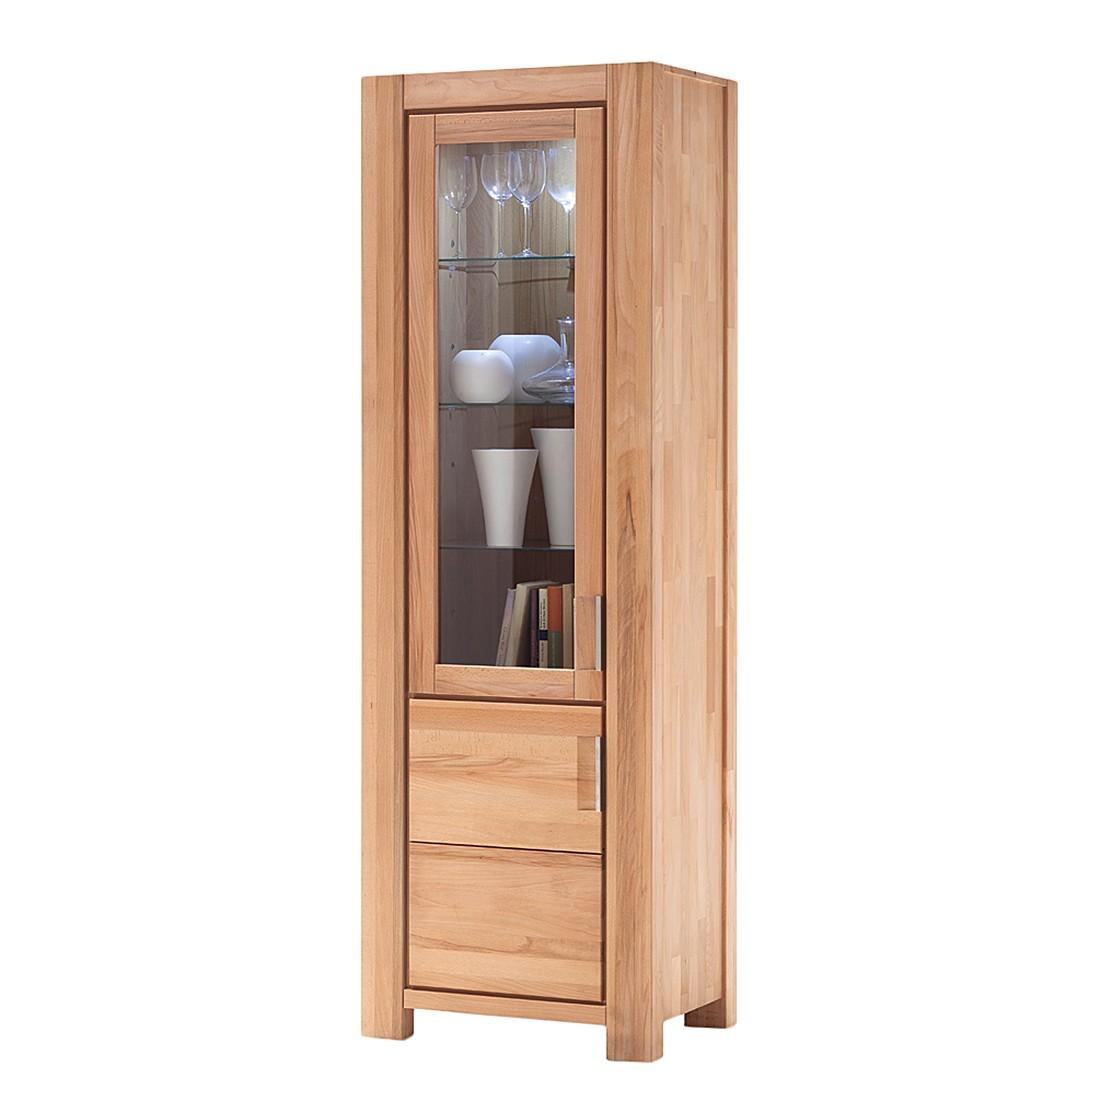 b cherregal raik kernbuche massiv ge lt jung s hne bestellen. Black Bedroom Furniture Sets. Home Design Ideas